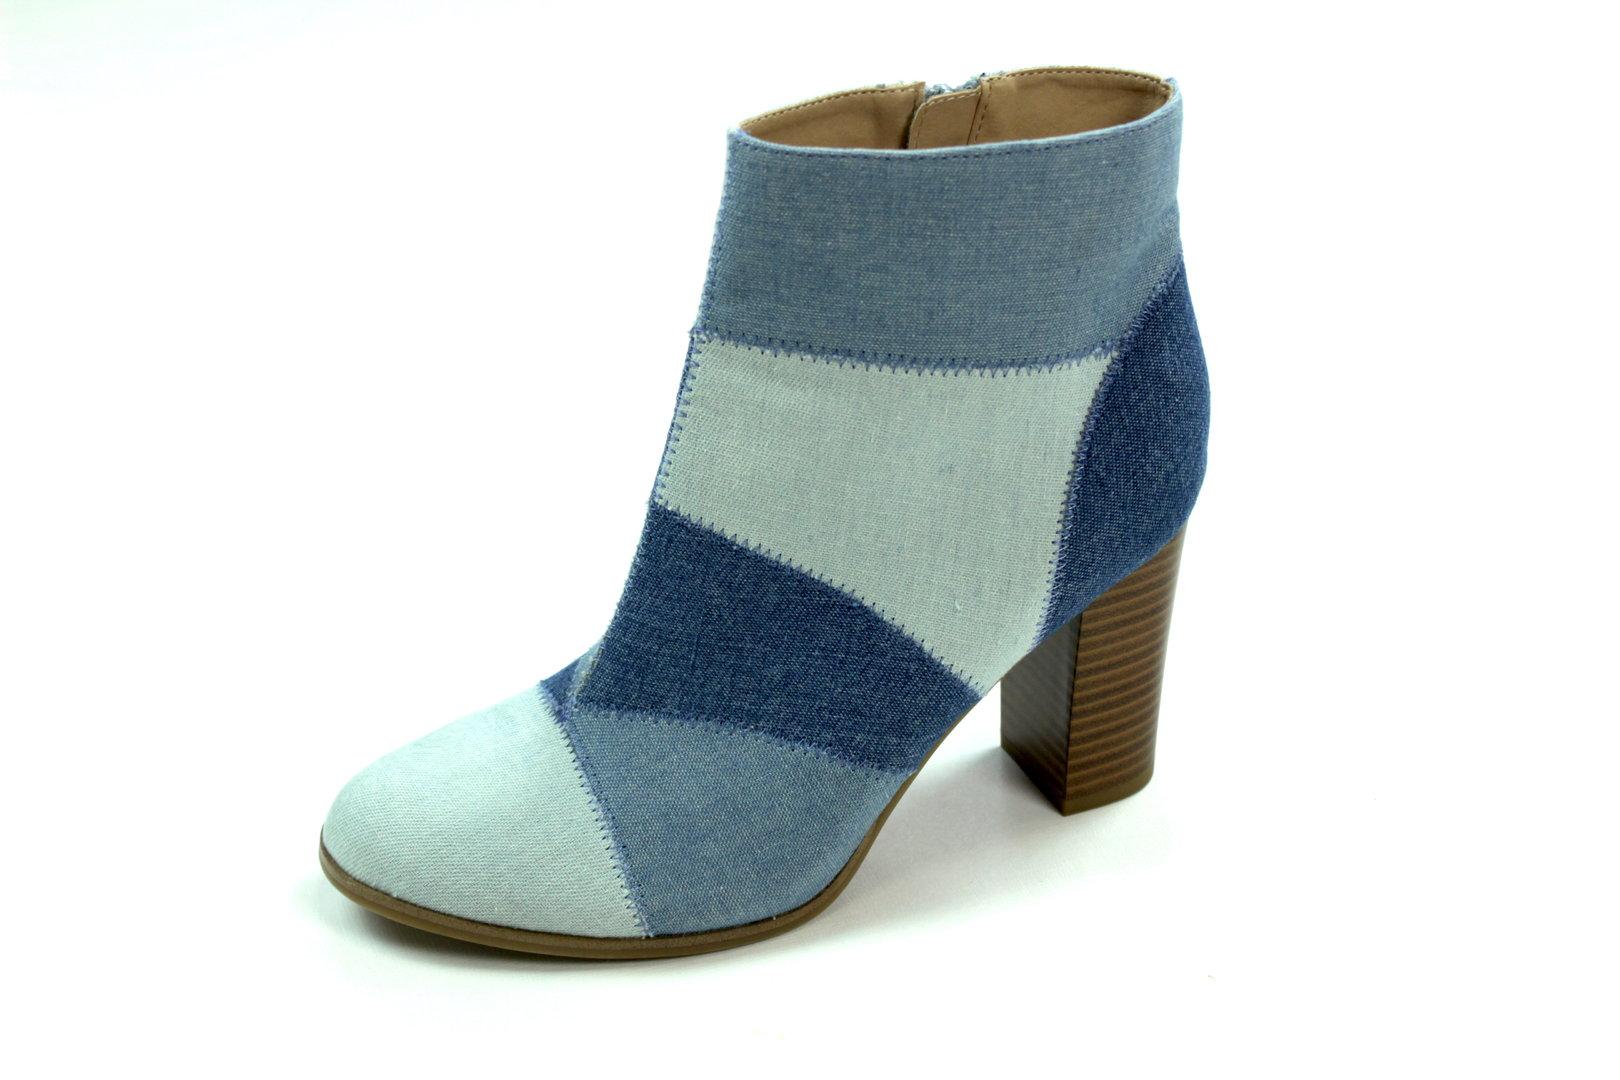 Blau 41 Damen Boots Gefüttert Catwalk Jeans Stiefeletten JclFK1